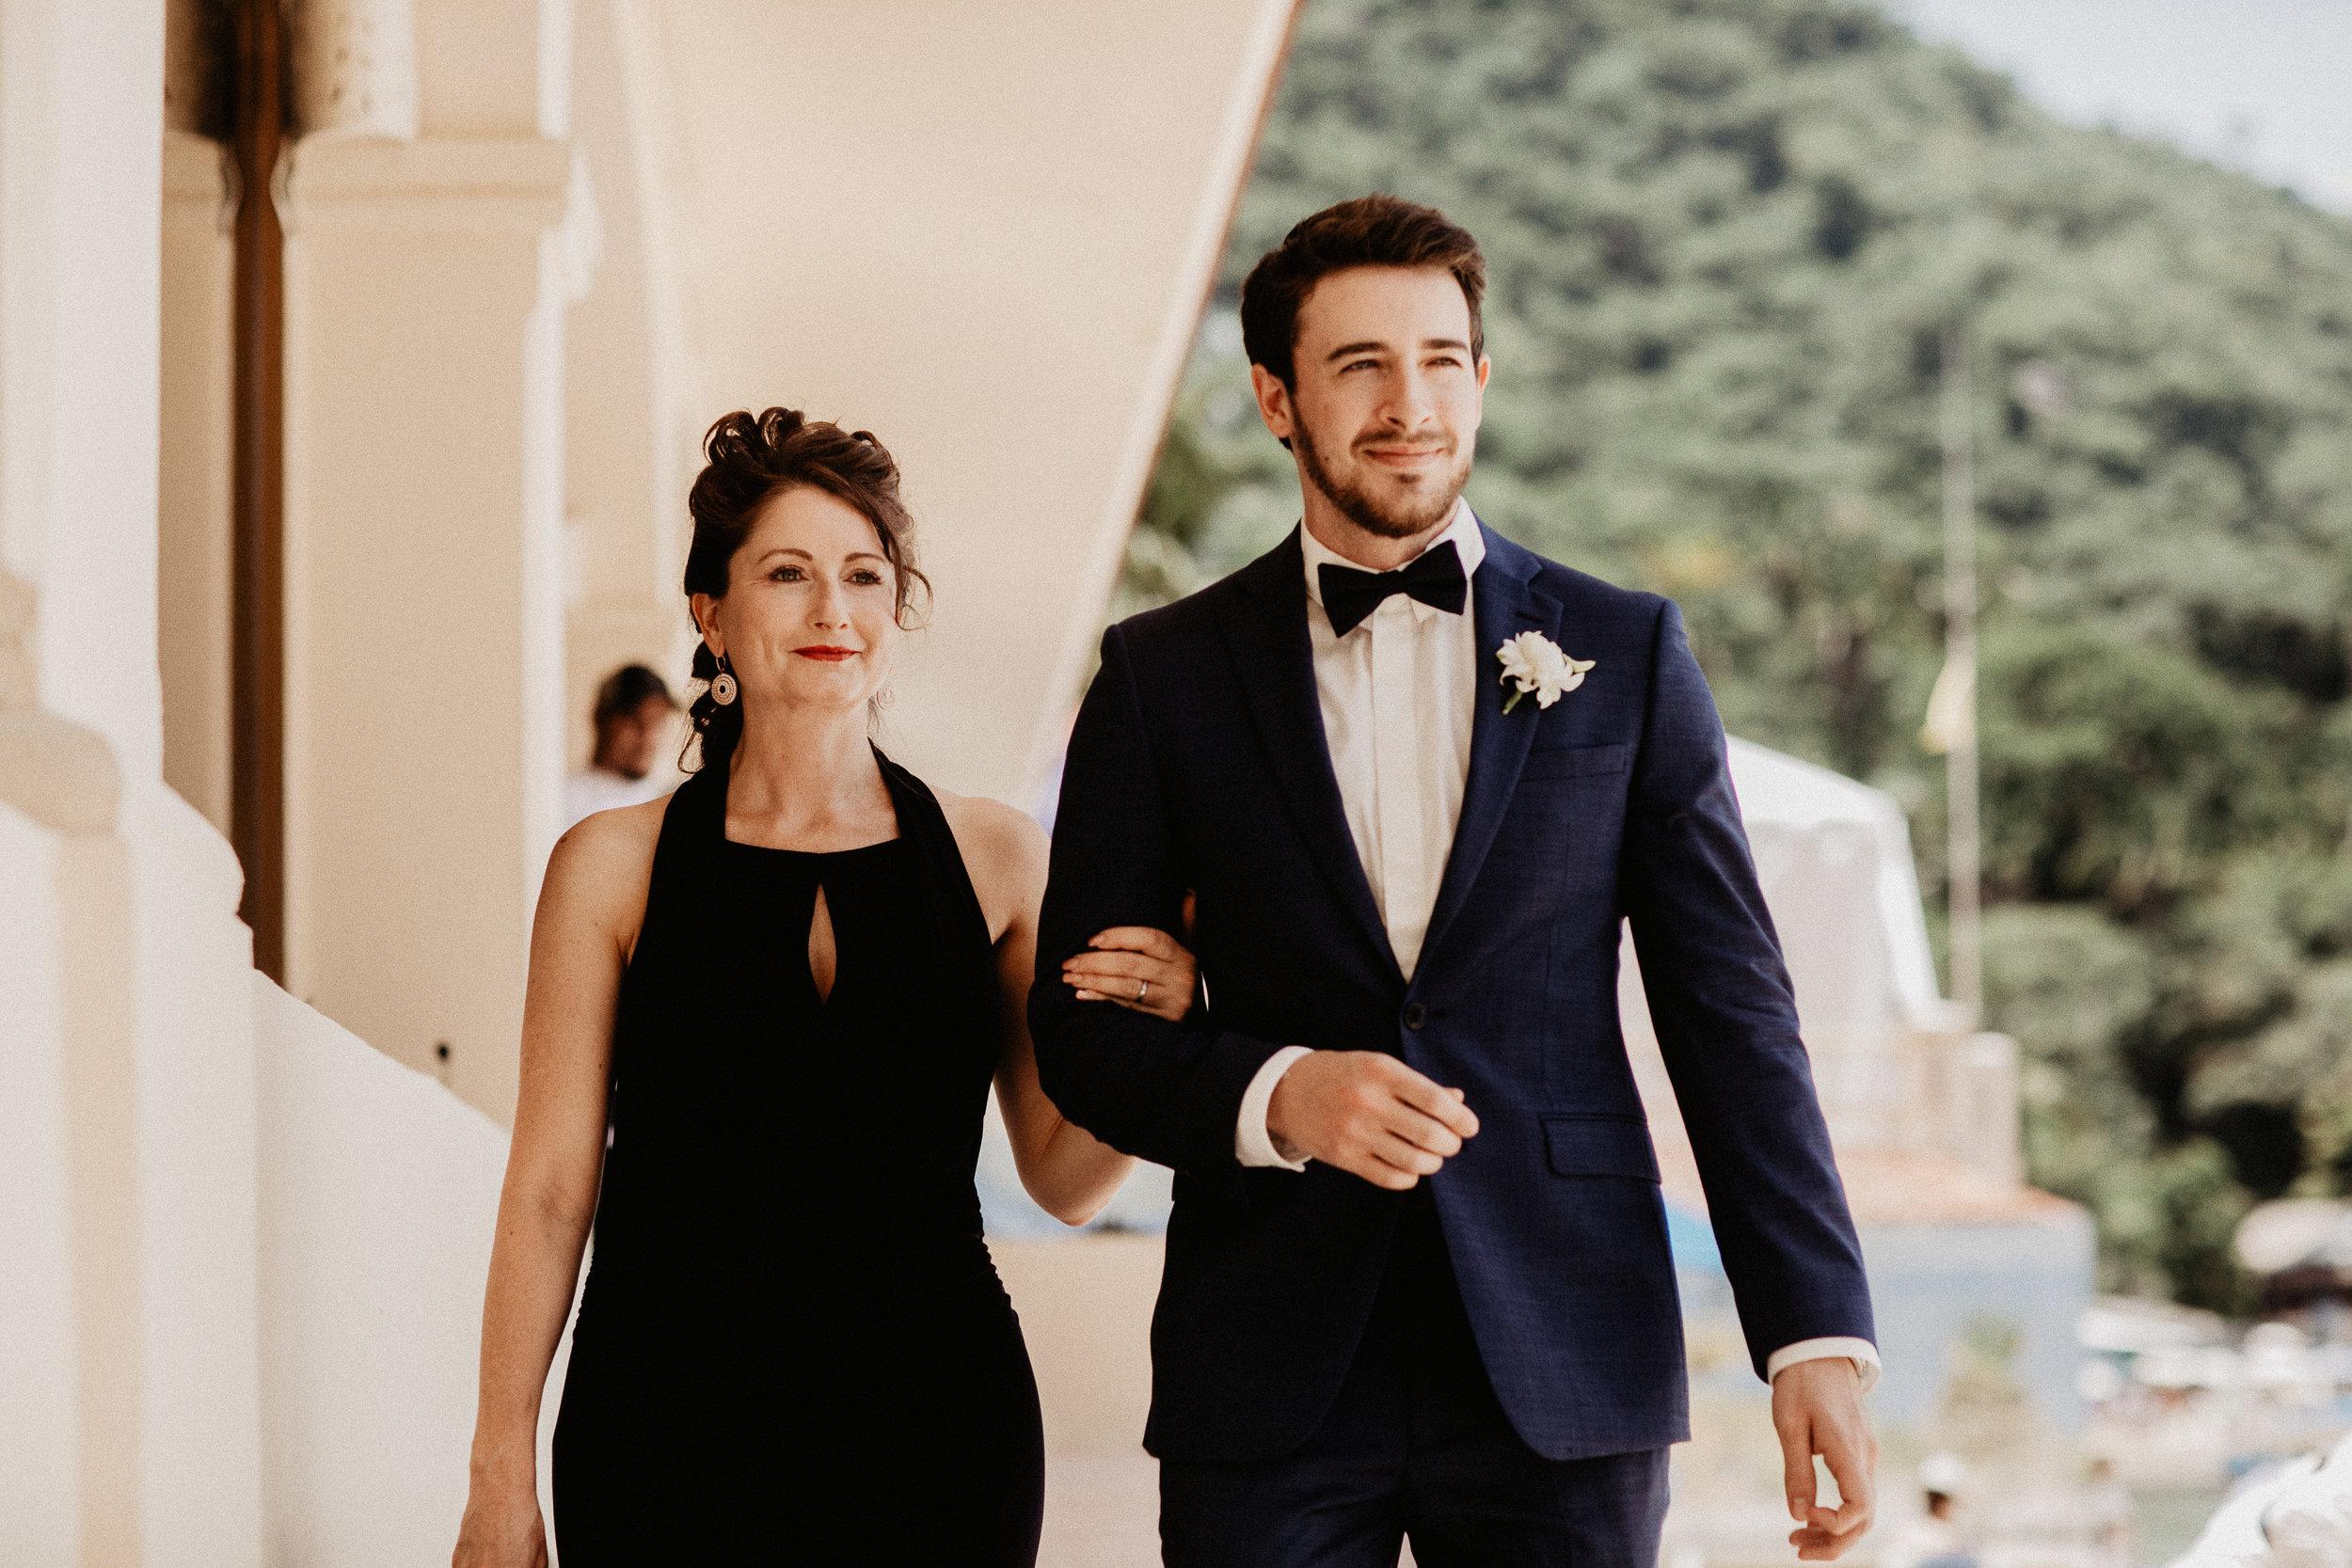 alfonso_flores_destination_wedding_photography_puerto_vallarta_hotel_barcelo_vallarta_cuttler_amela-201.JPG